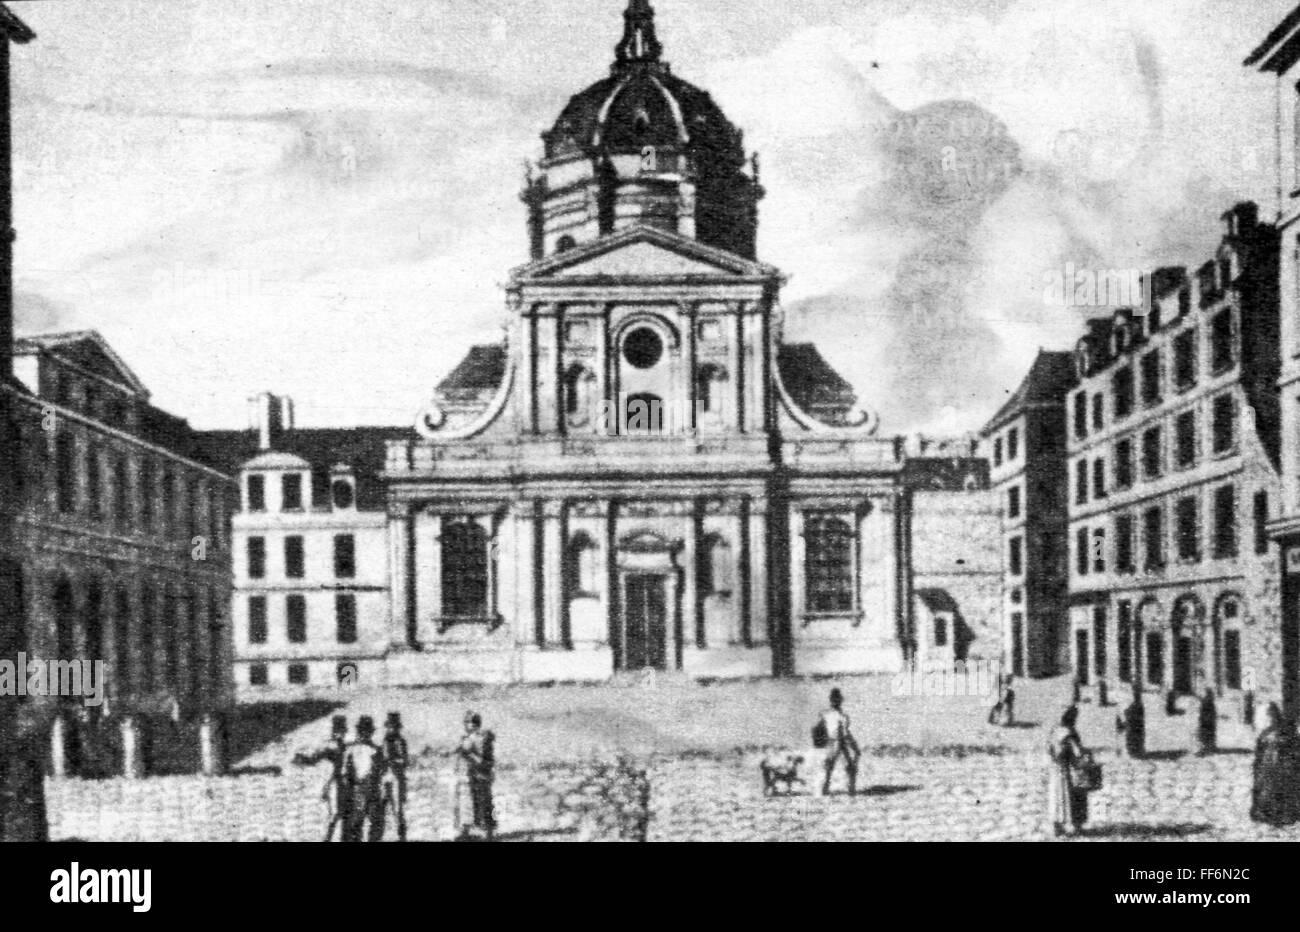 geography / travel, France, Paris, buildings, university, exterior view, Sainte Ursule chapel, engraving, 19th century, - Stock Image